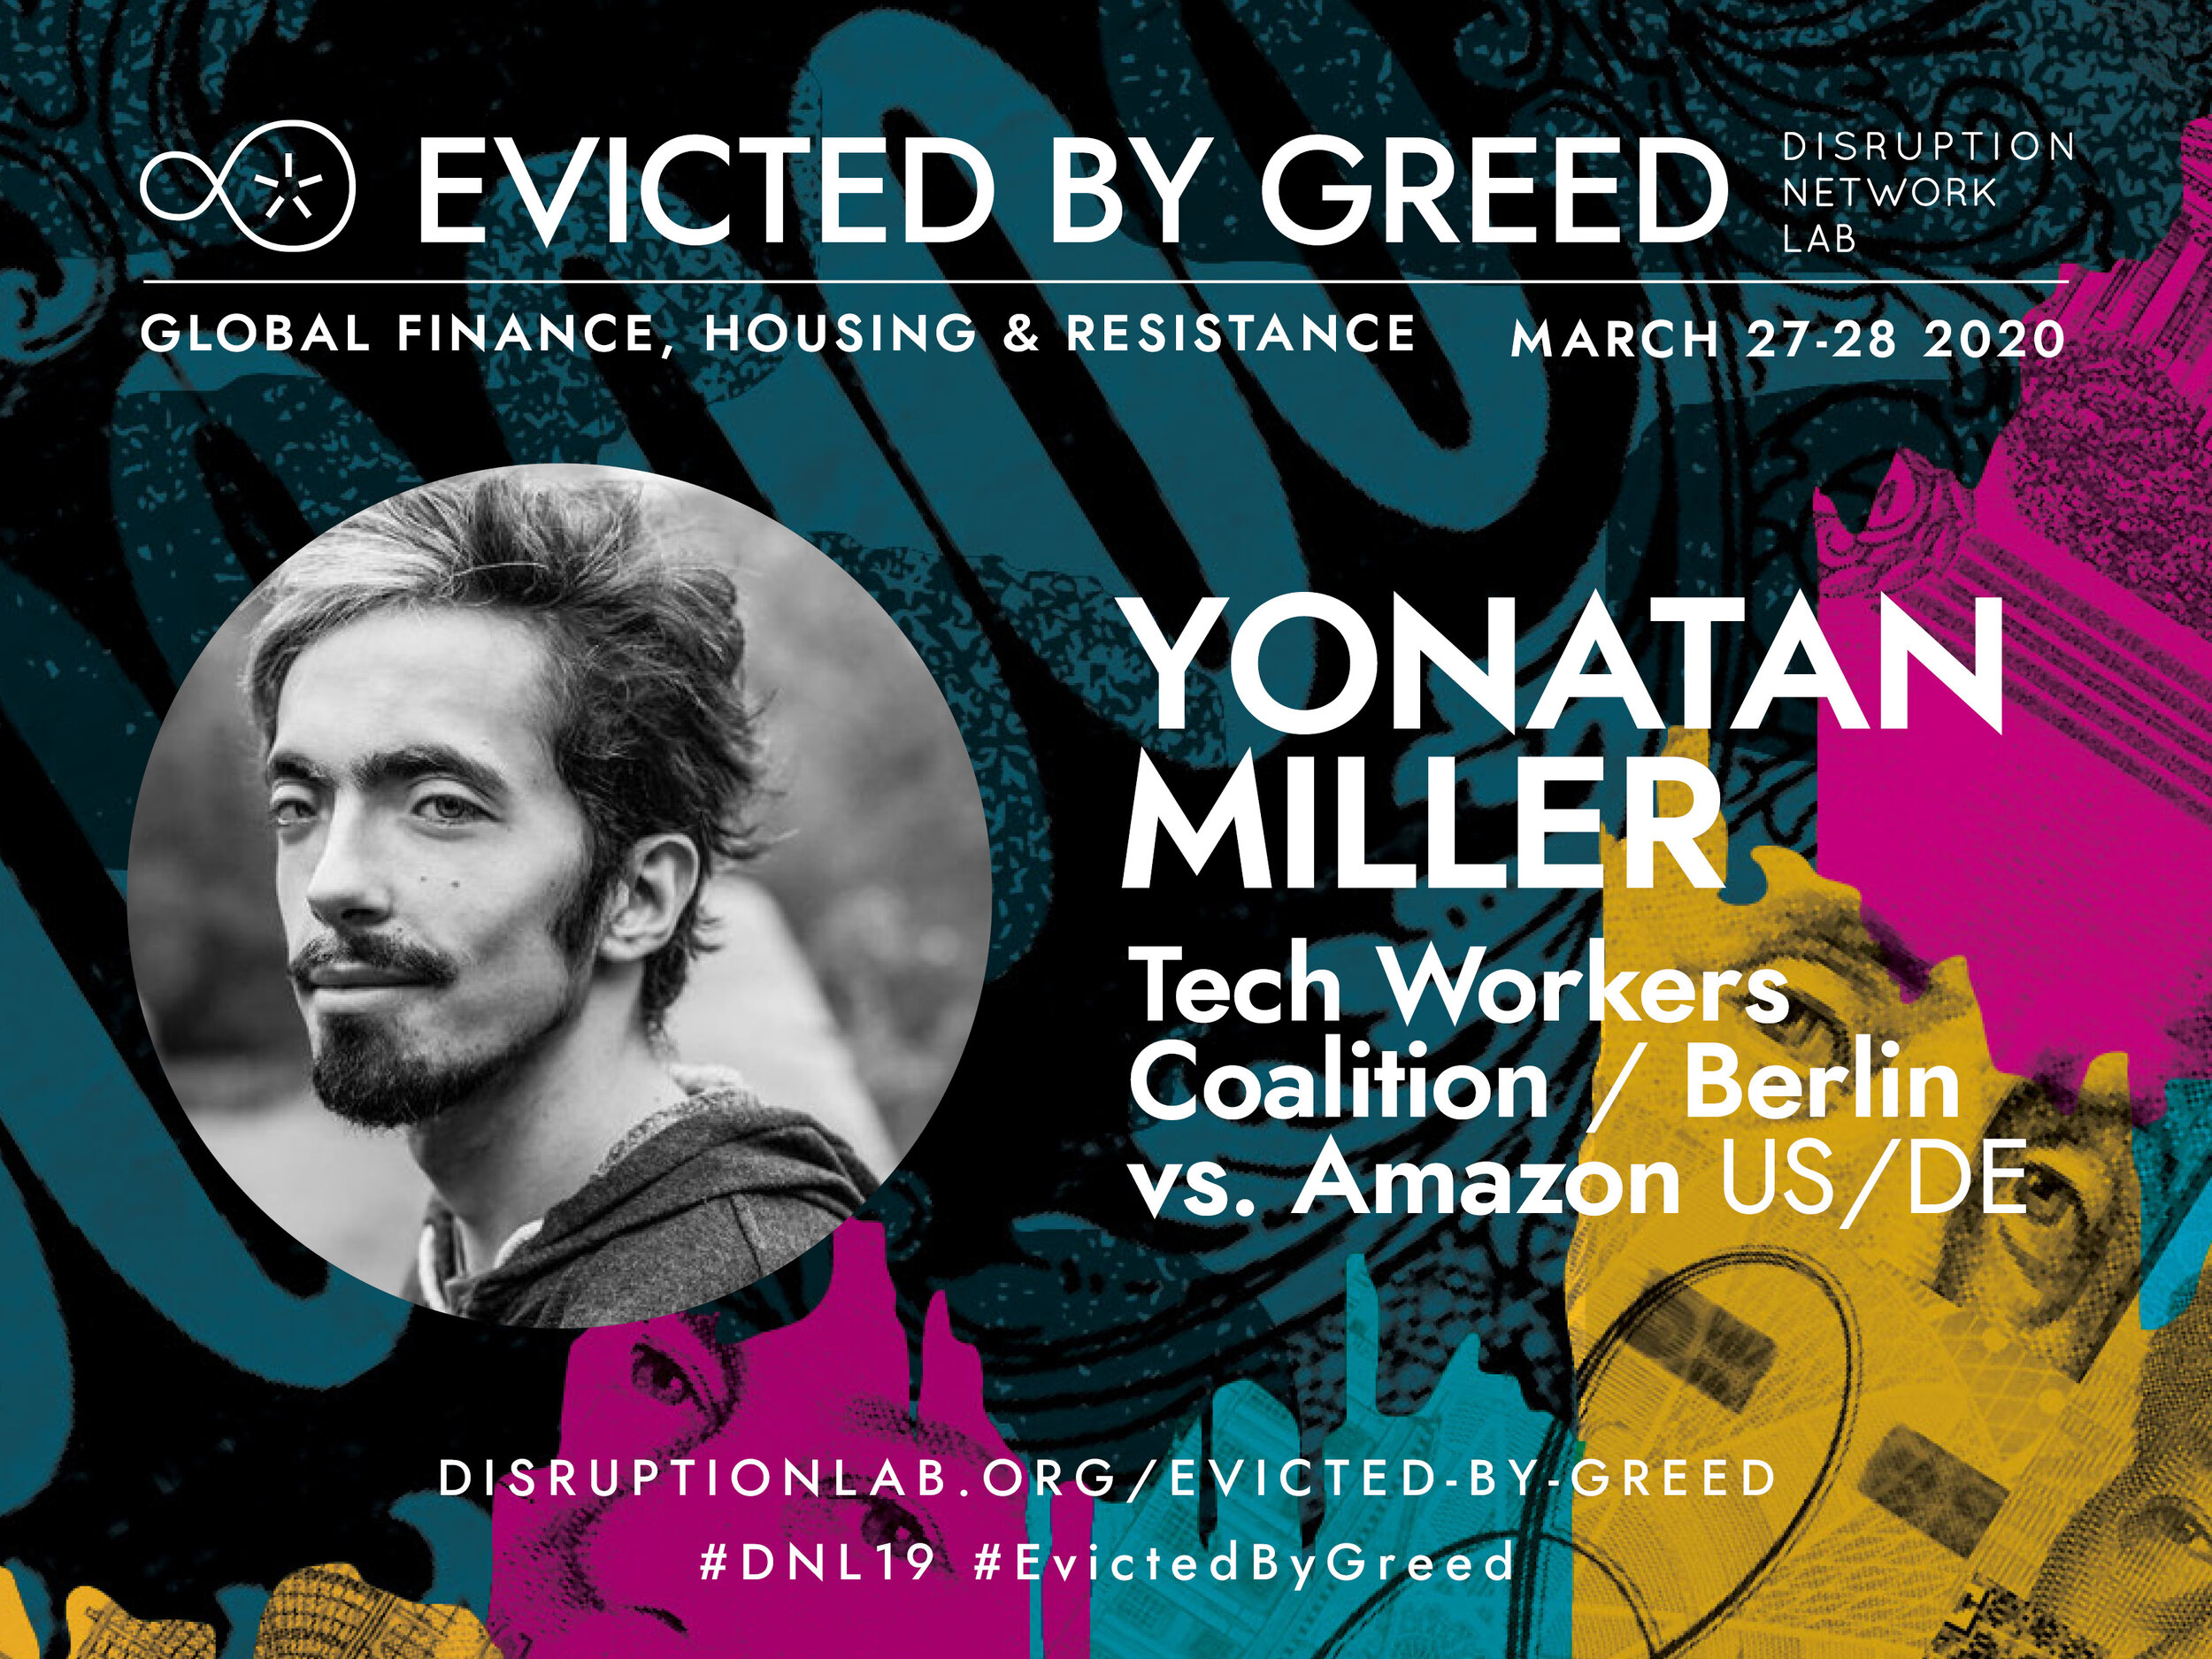 Yonatan Miller, Tech Workers Coalition, Berlin Vs Amazon